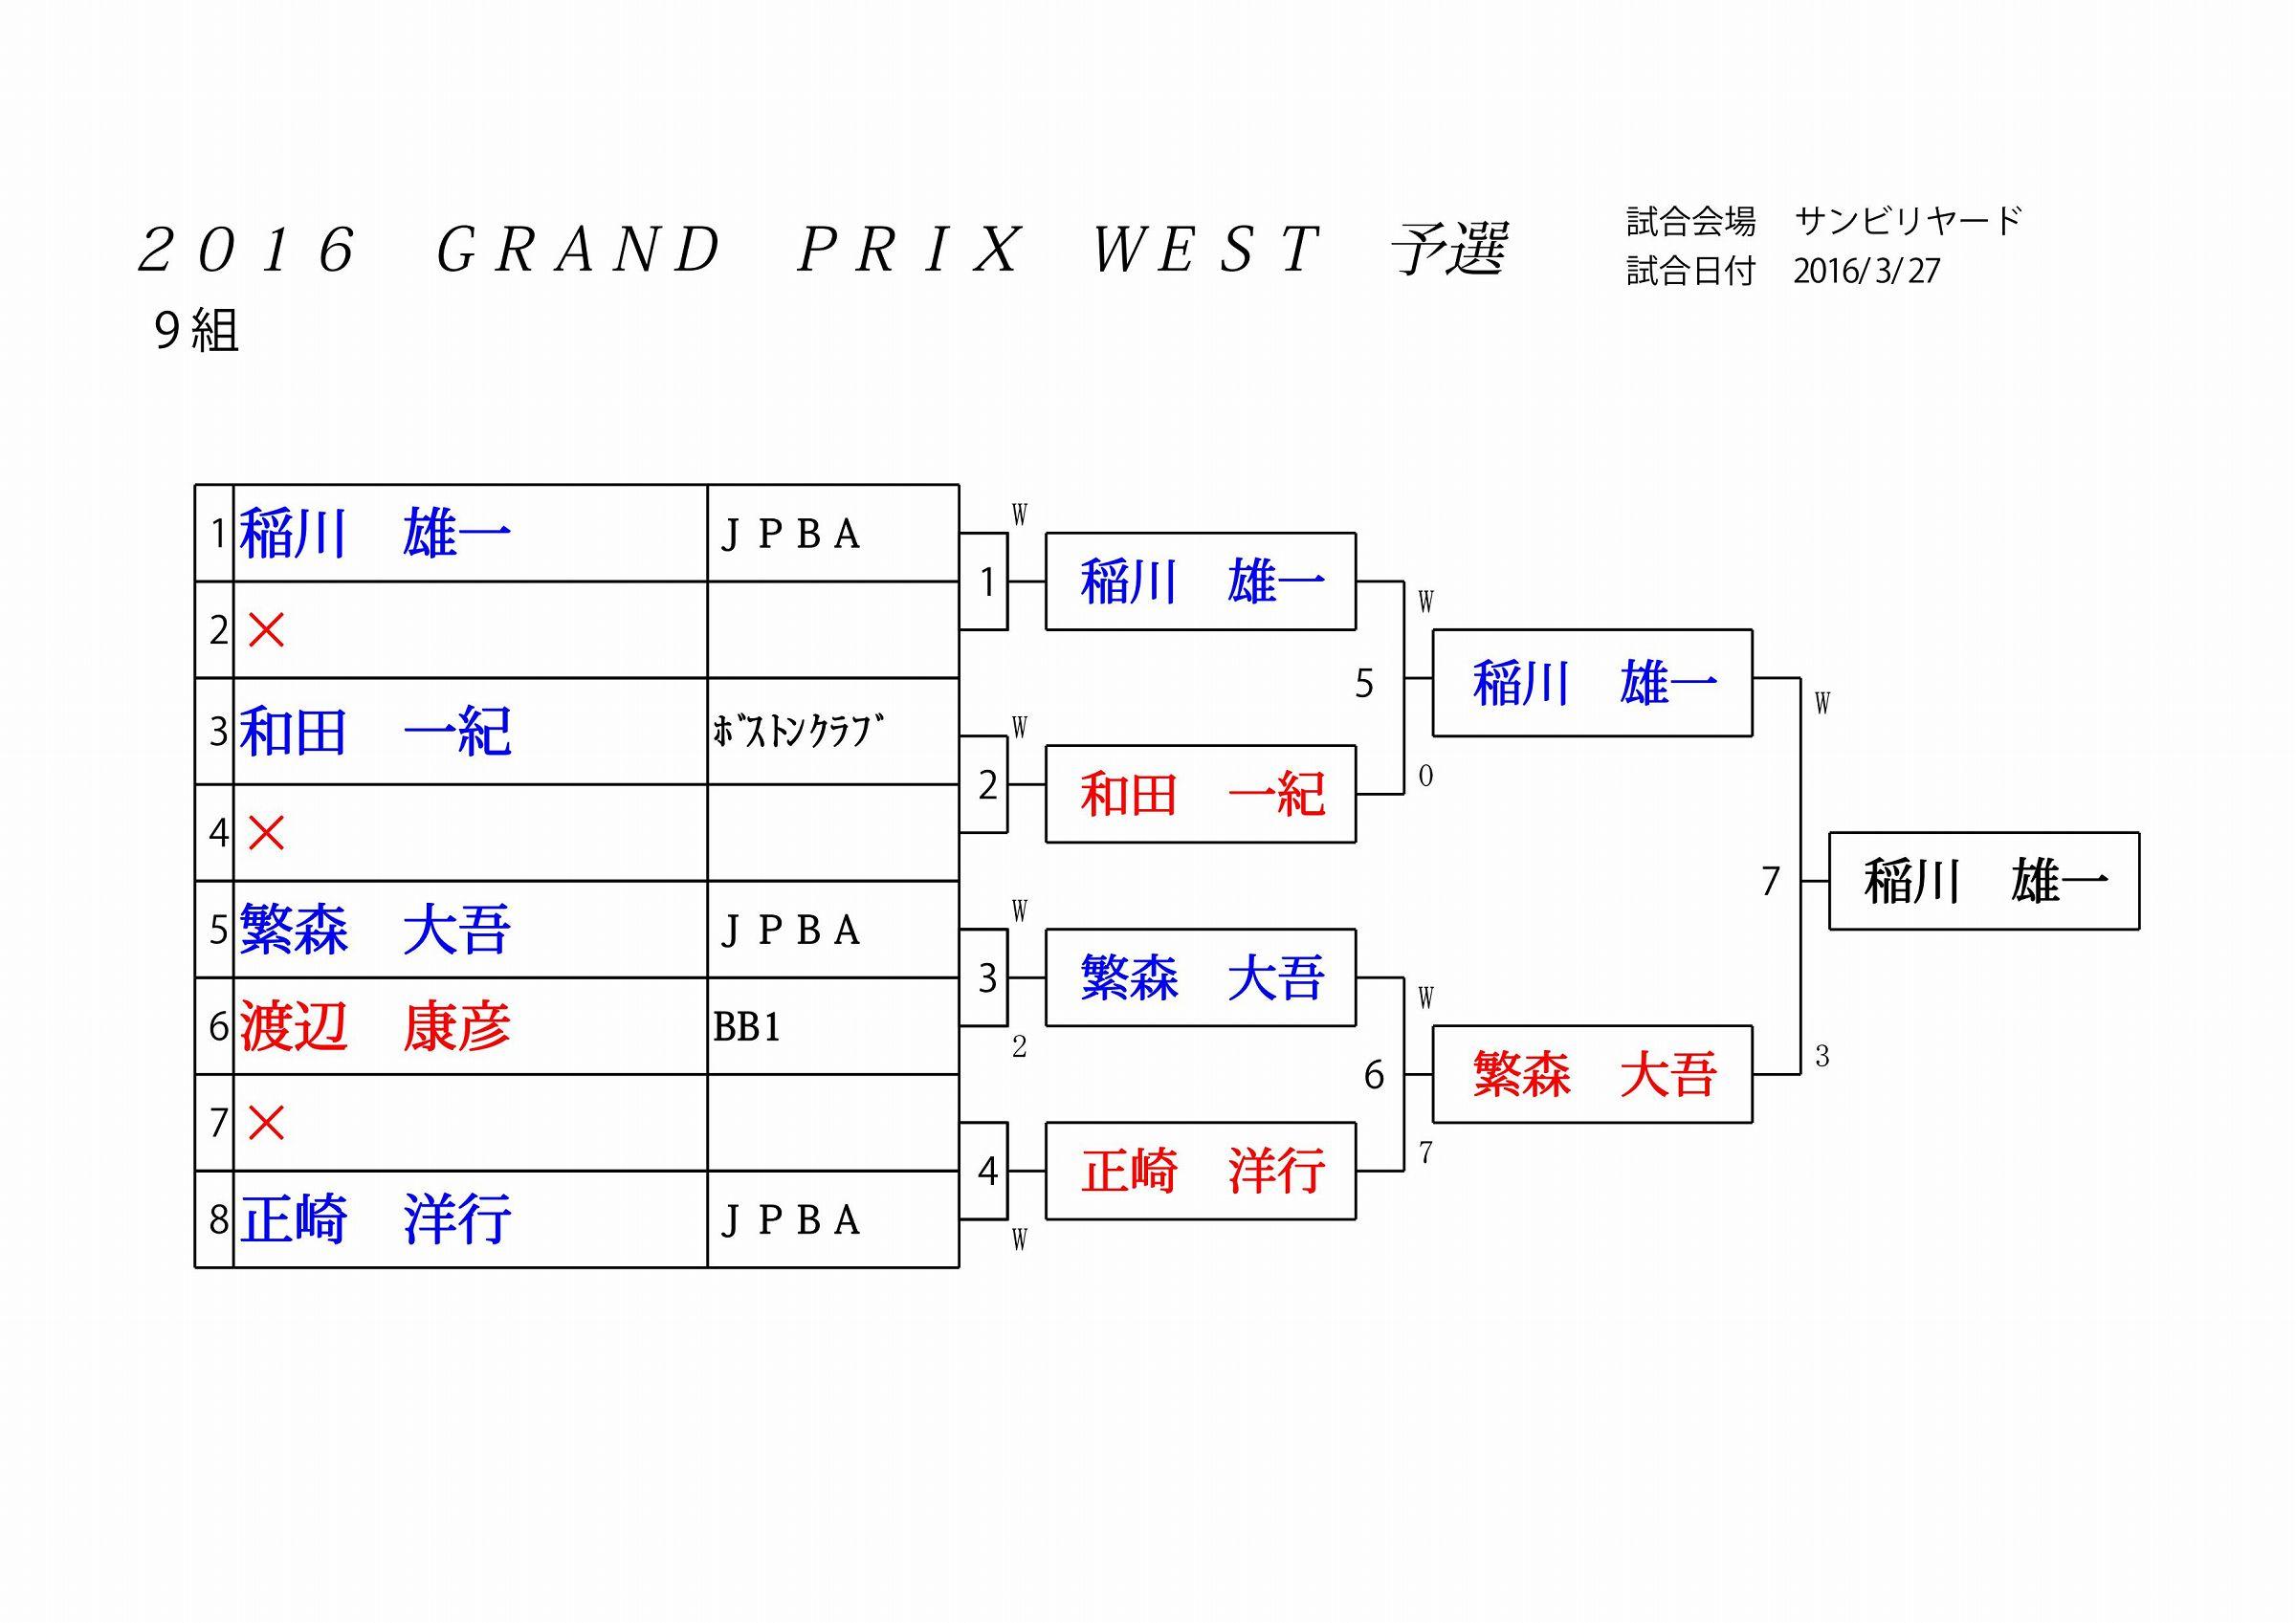 2016 GRAND PRIX WEST 予選_09